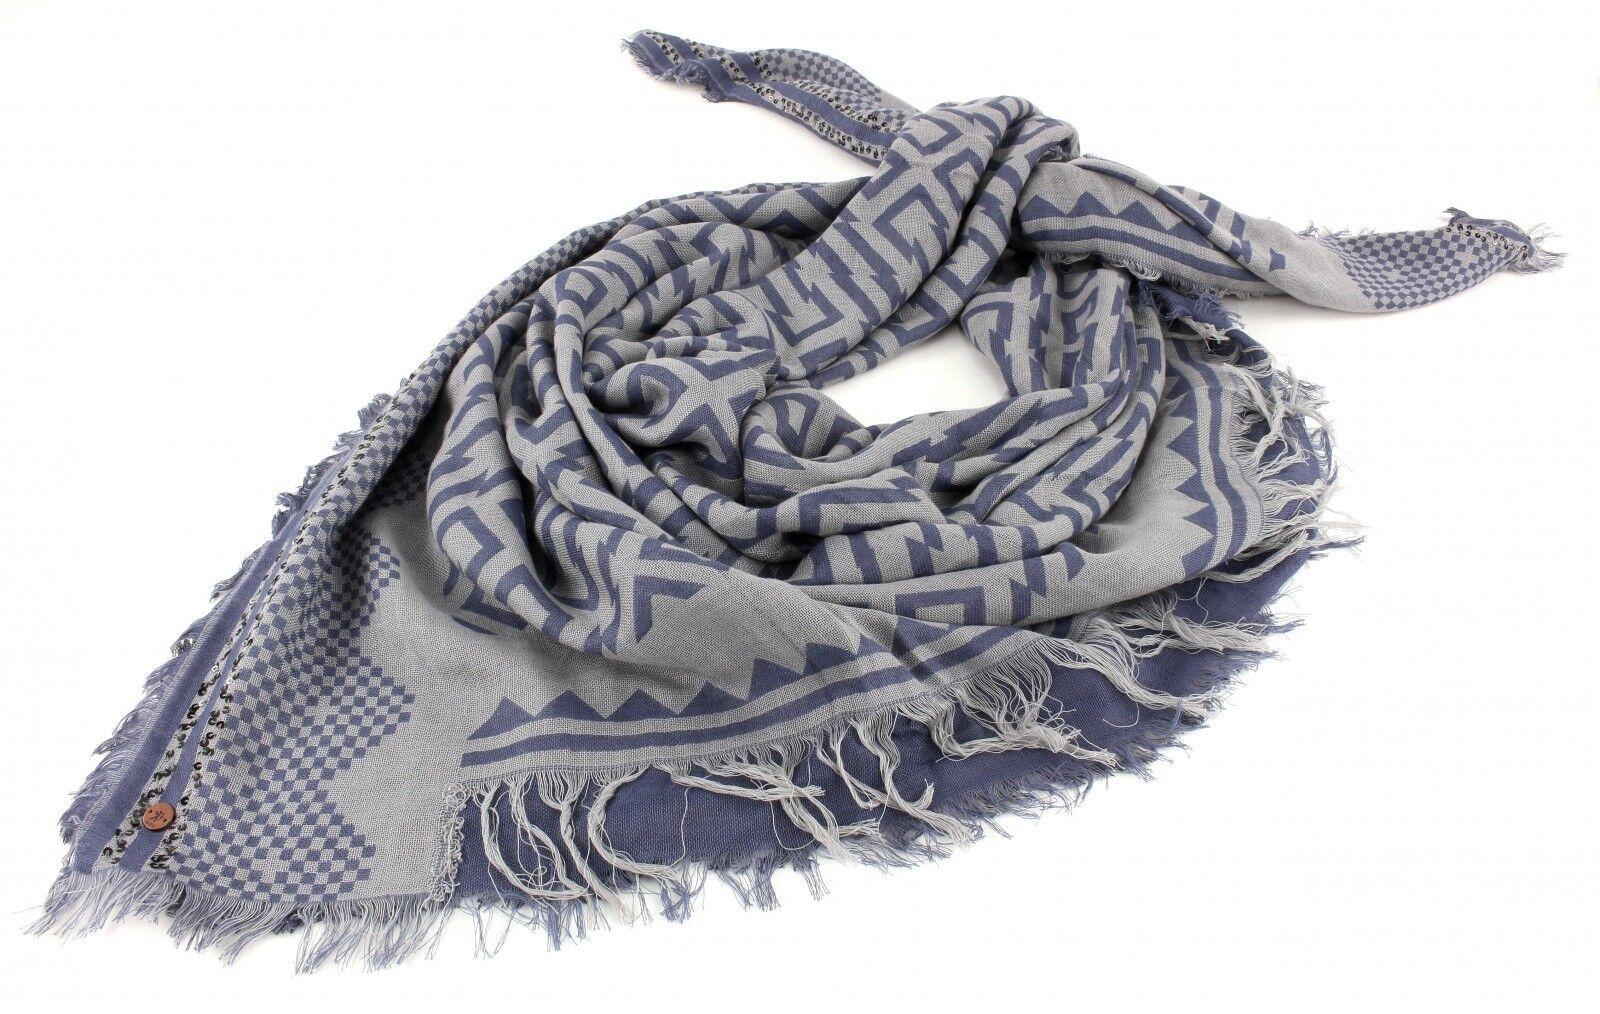 ESPRIT edc 2Tone Jacquard Square Scarf Schal Dreieckstuch Grey Blue Blau Grau